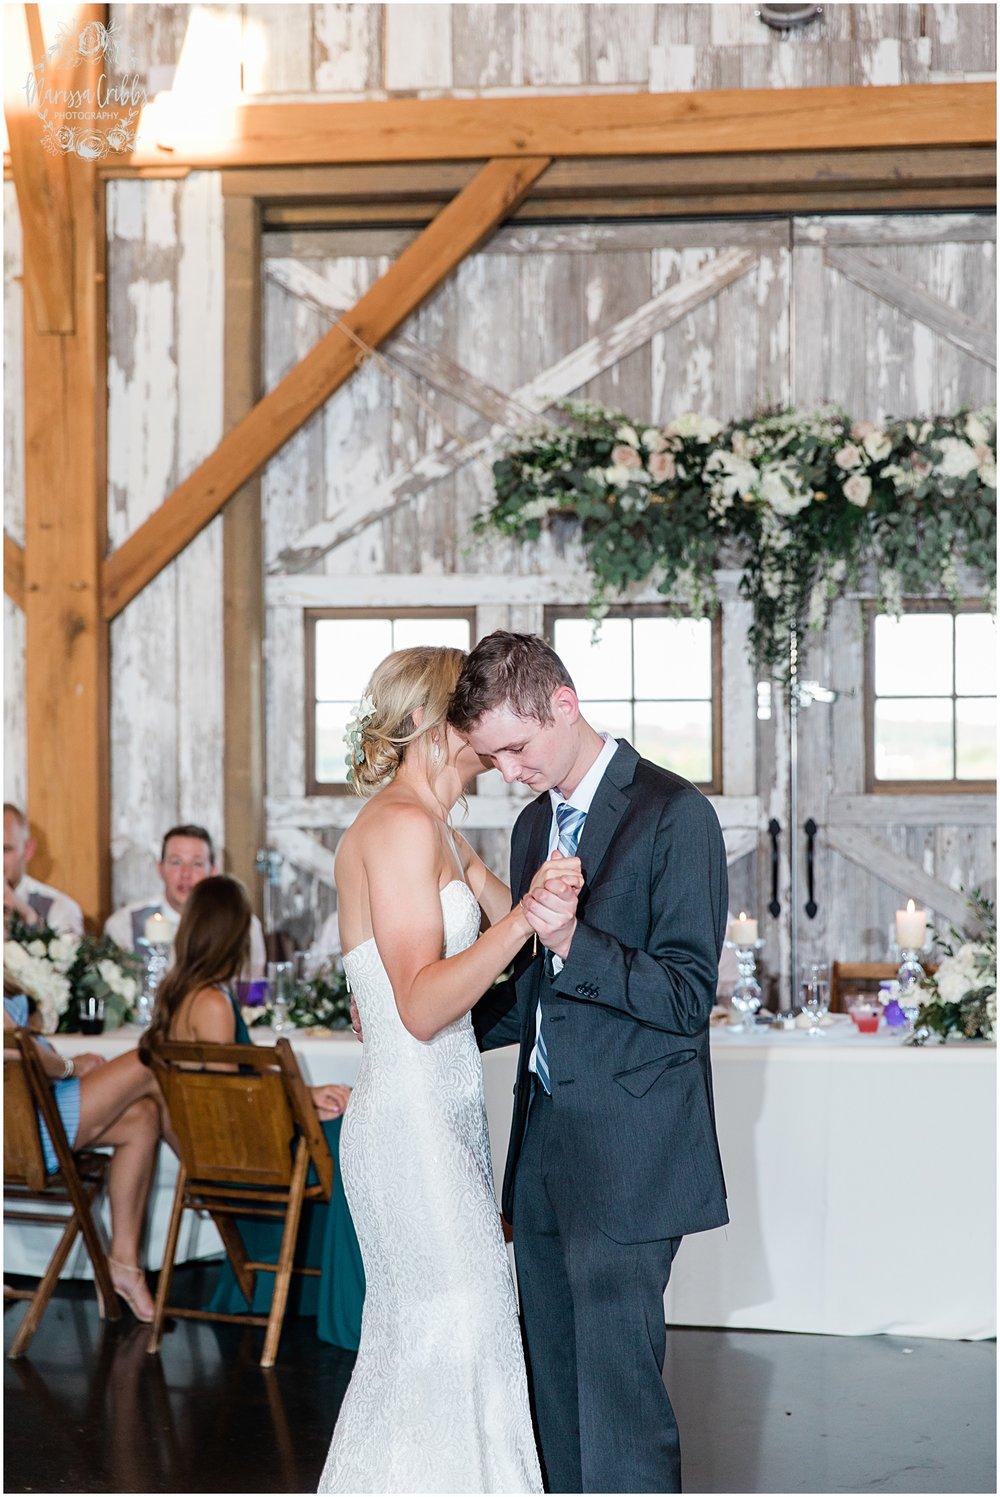 RHODES WEDDING | WESTON RED BARN FARM | MARISSA CRIBBS PHOTOGRAPHY_5314.jpg